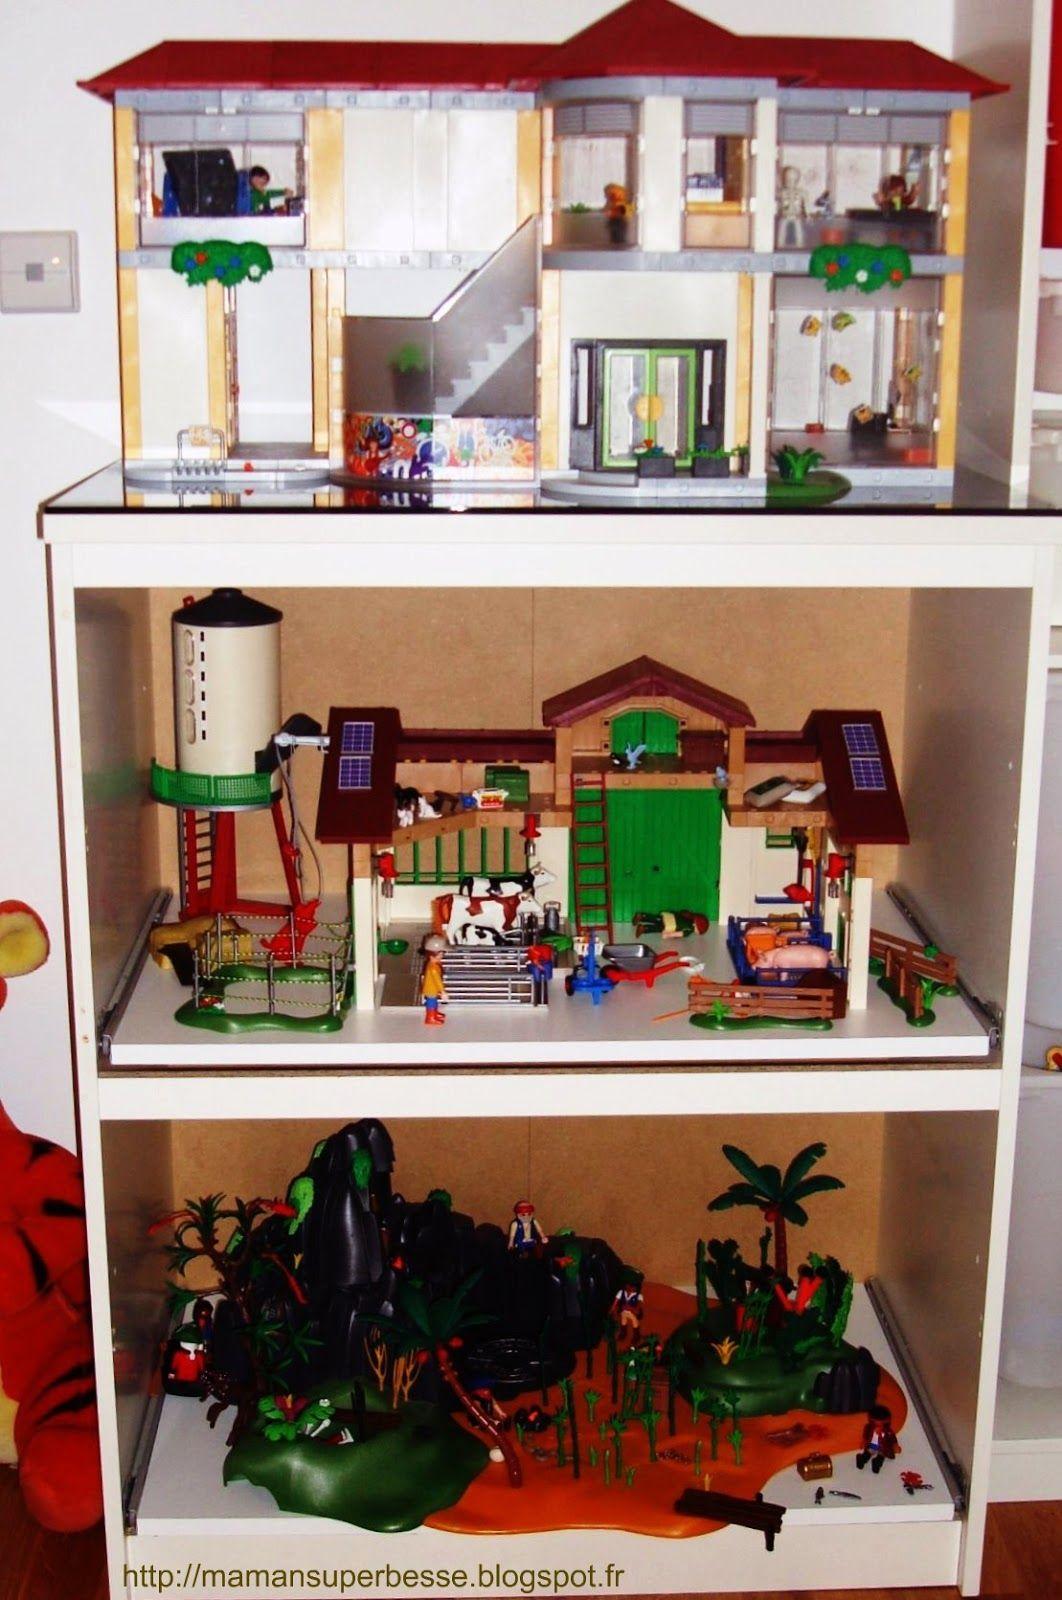 Ya Maman A La Maison Meuble Playmobil Organisation Pret A Jouer